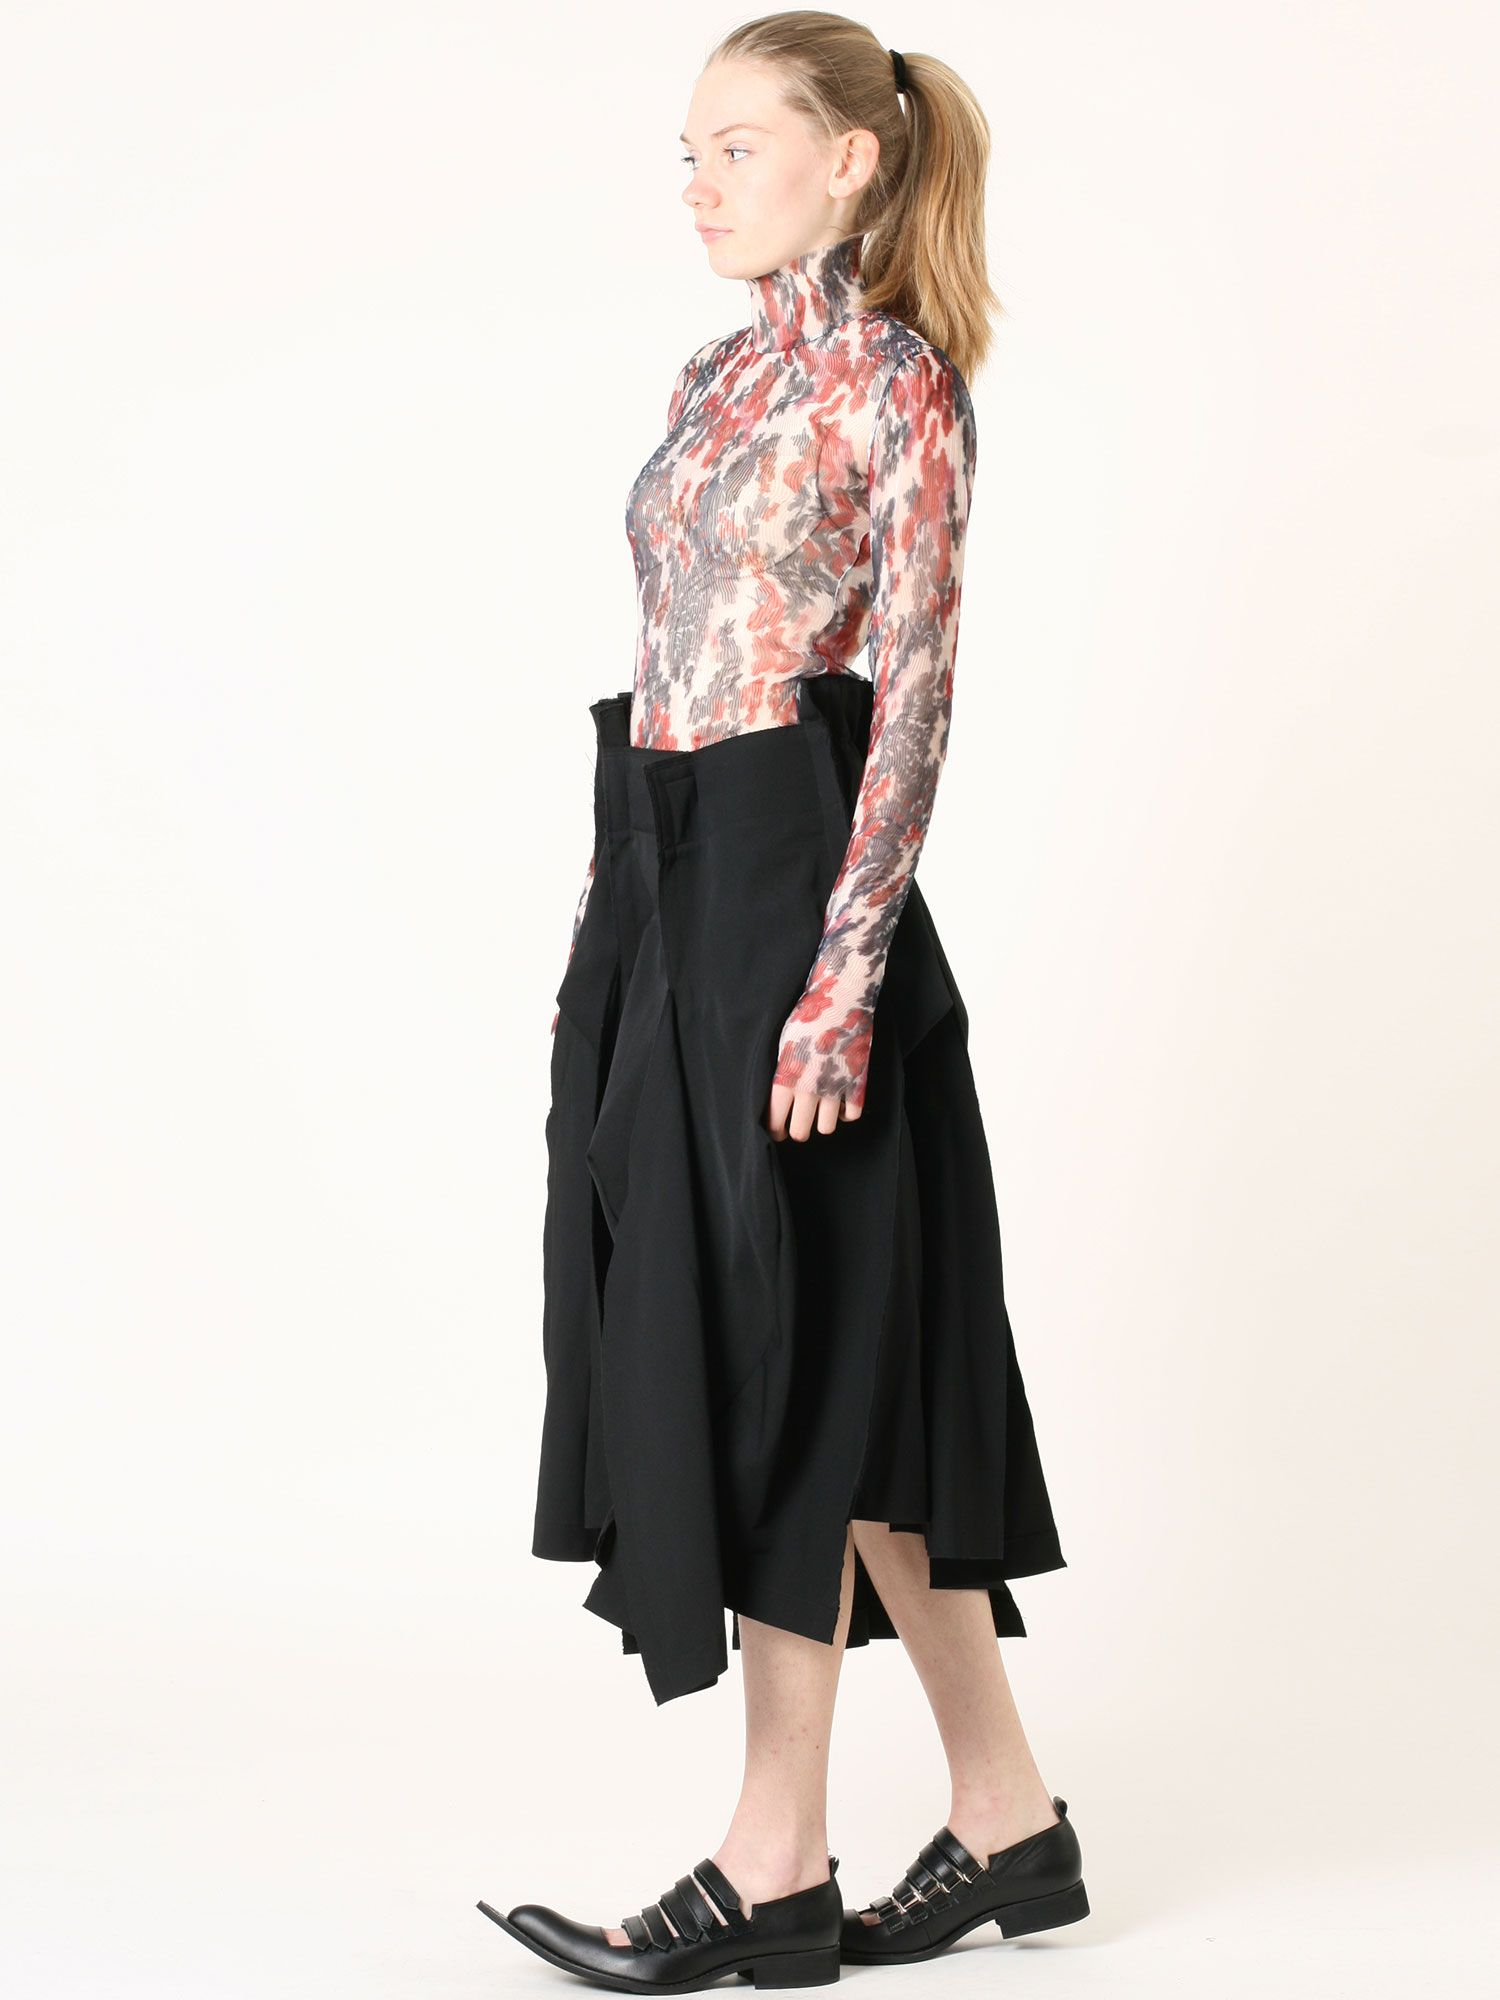 Spring 2016 look: Comme des Garcons skirt&shoes, Yang Li body